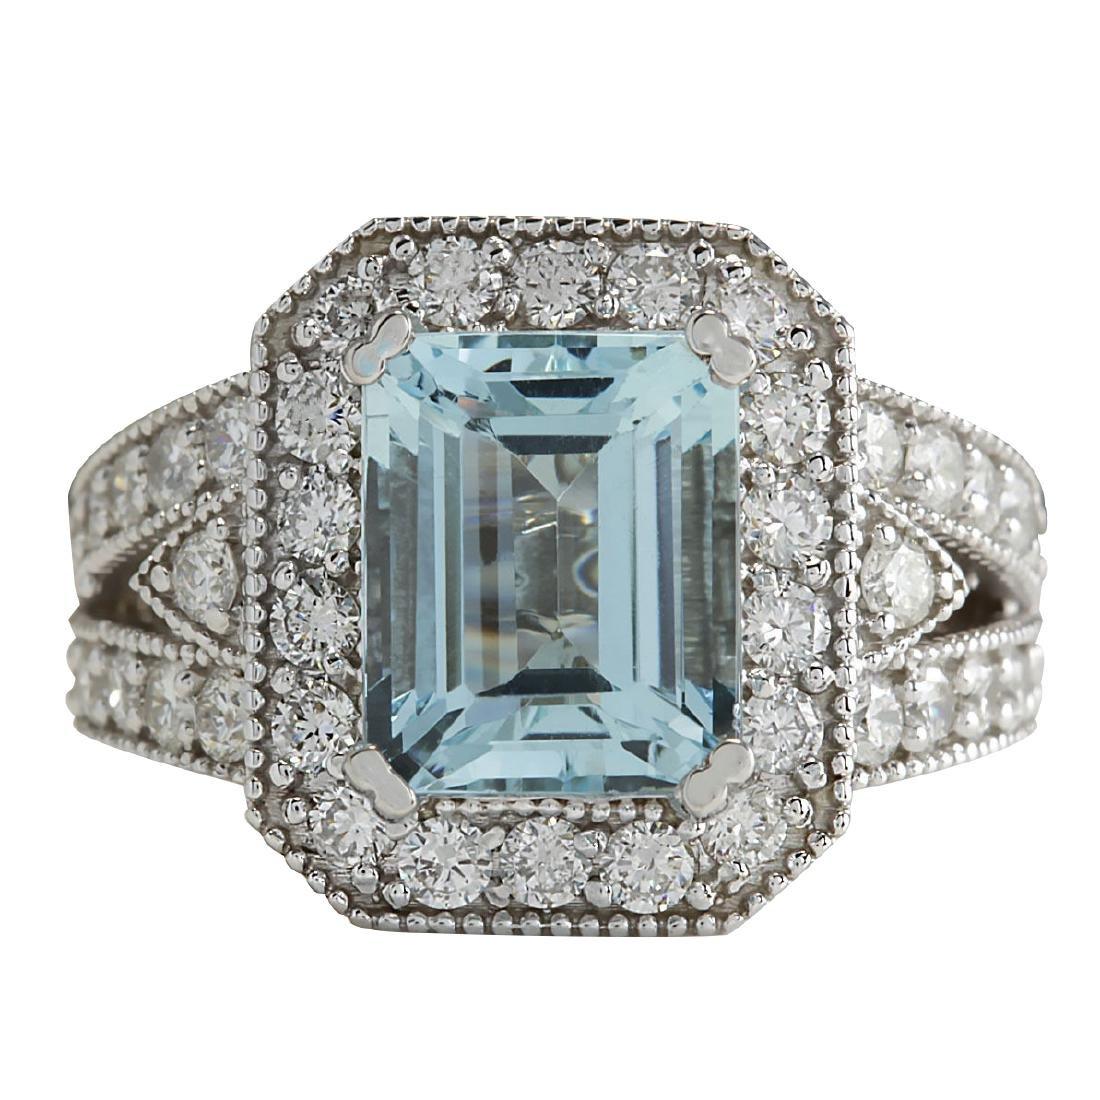 4.67CTW Natural Aquamarine And Diamond Ring In 18K